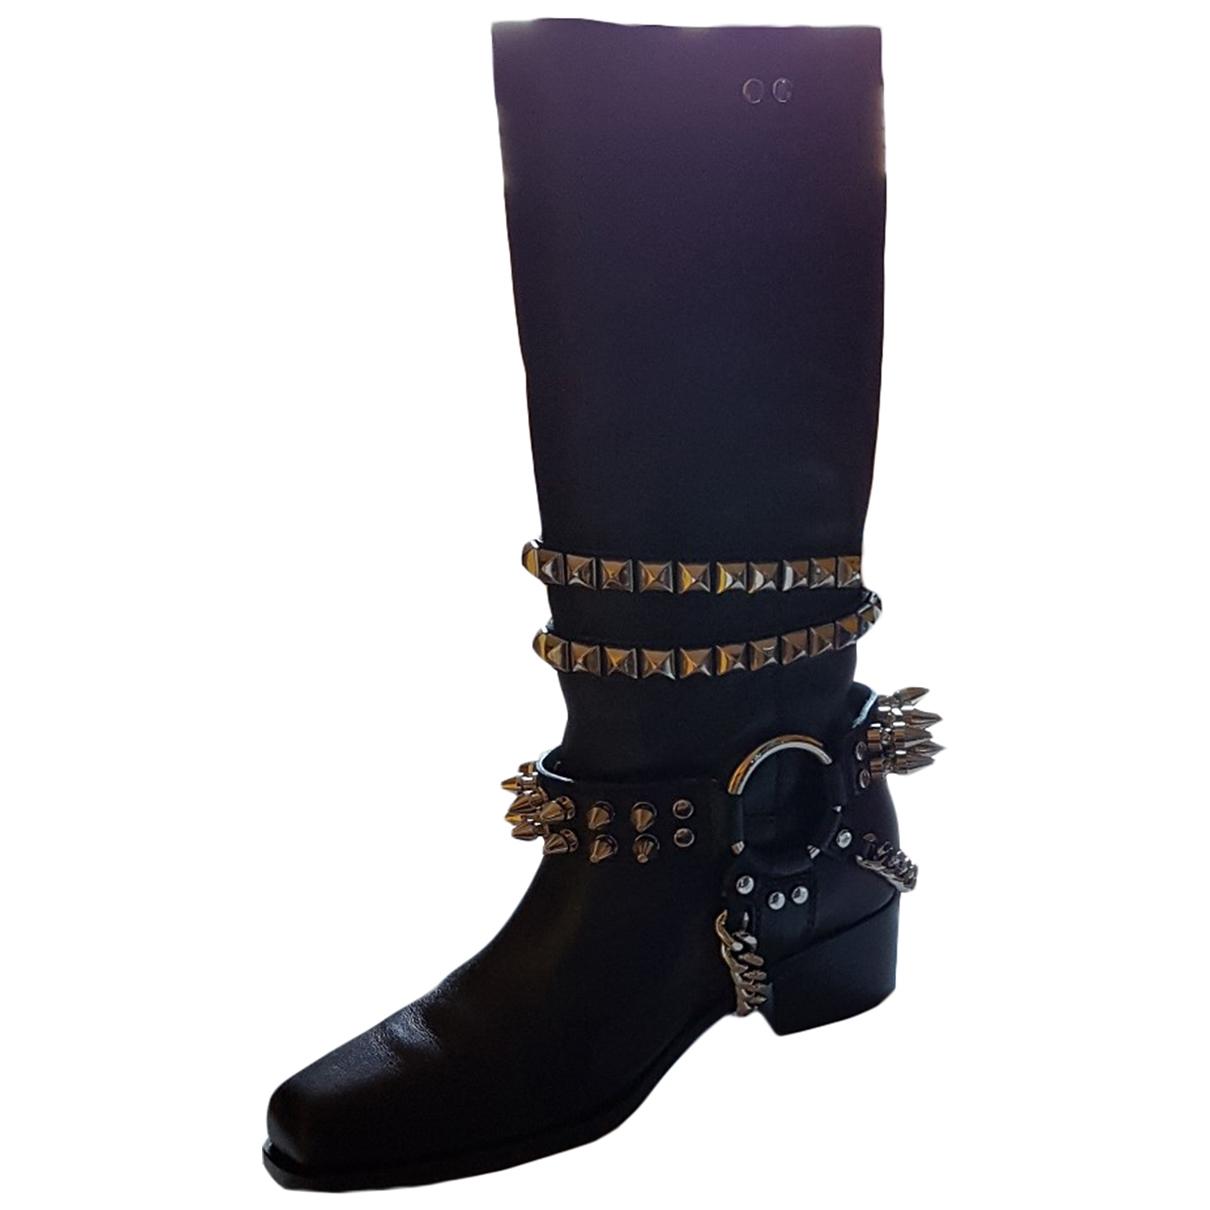 Botas altas de Cuero Moschino